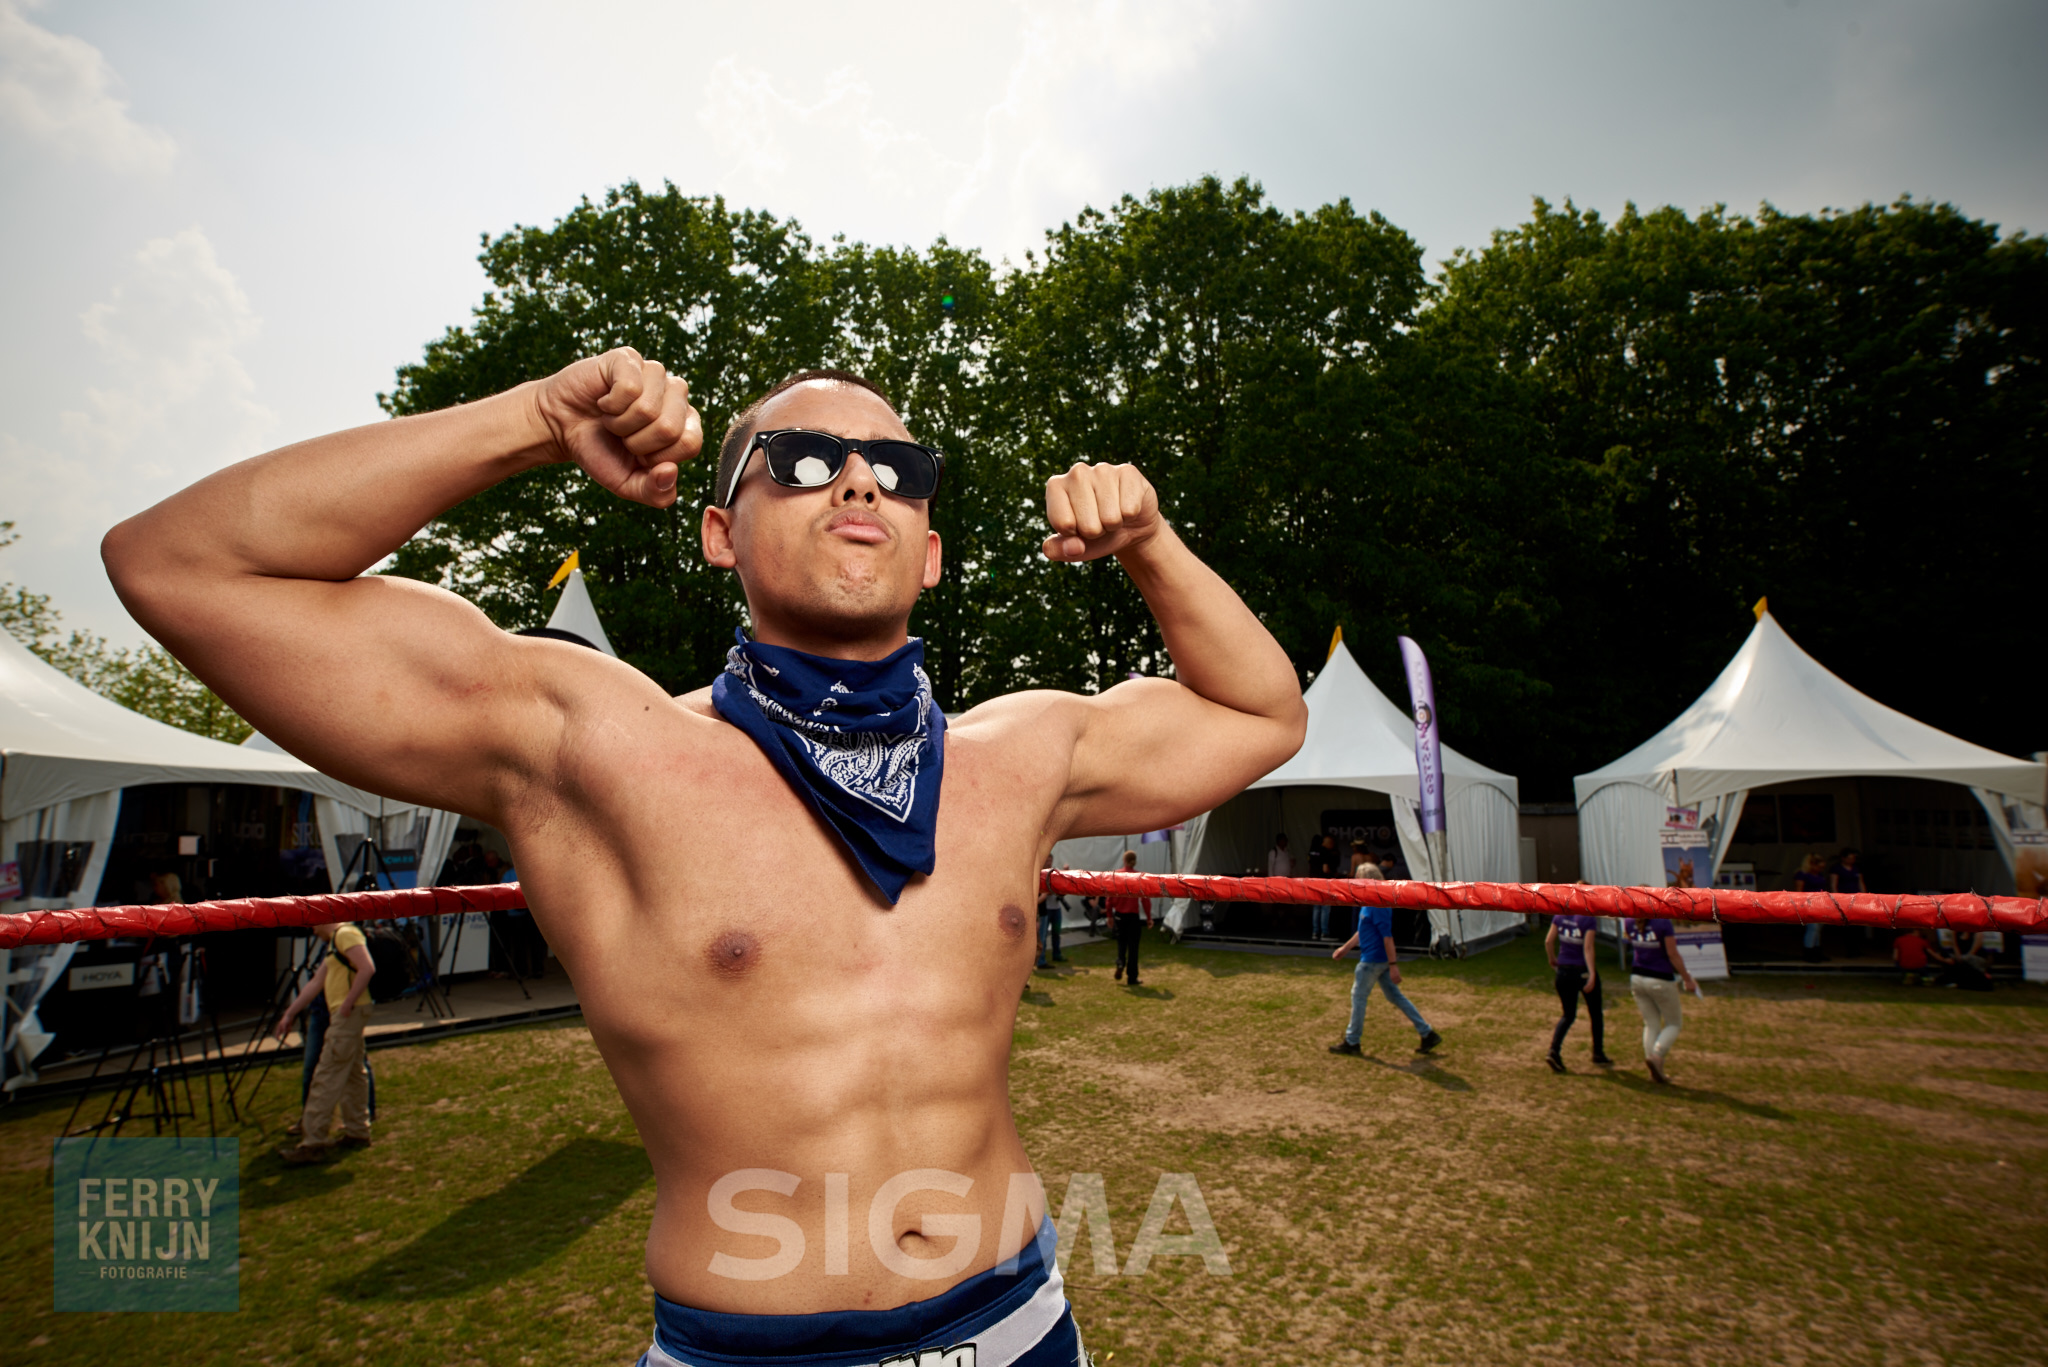 16_05_28_NIKON D750_Sigma FotoFair Wrestling__DSC0809_HighWeb.jpg